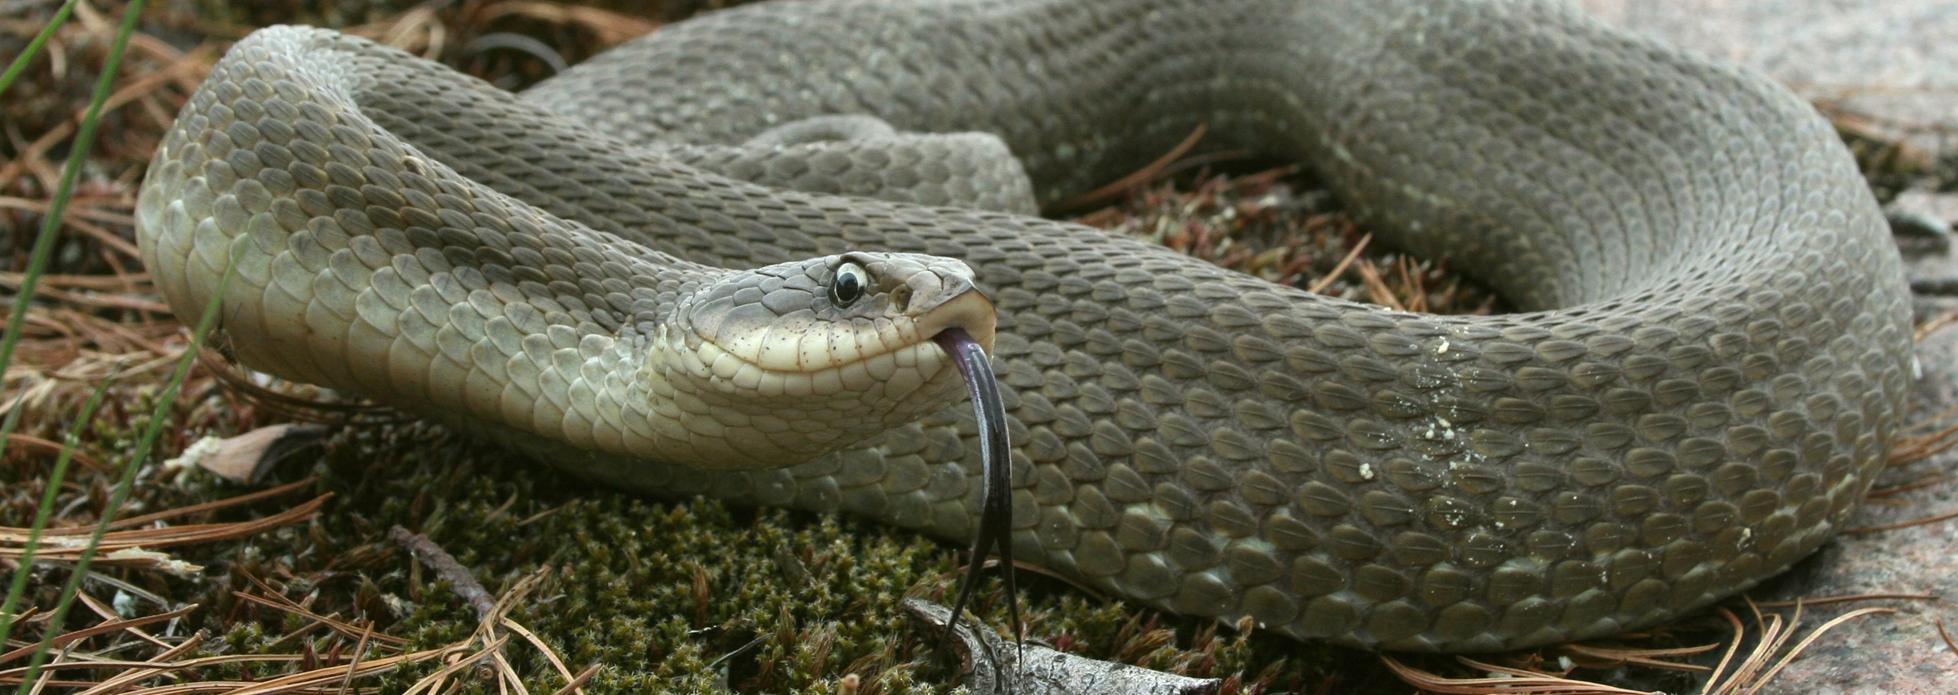 Eastern Hog-nosed Snake | Reptiles & Amphibians Ontario